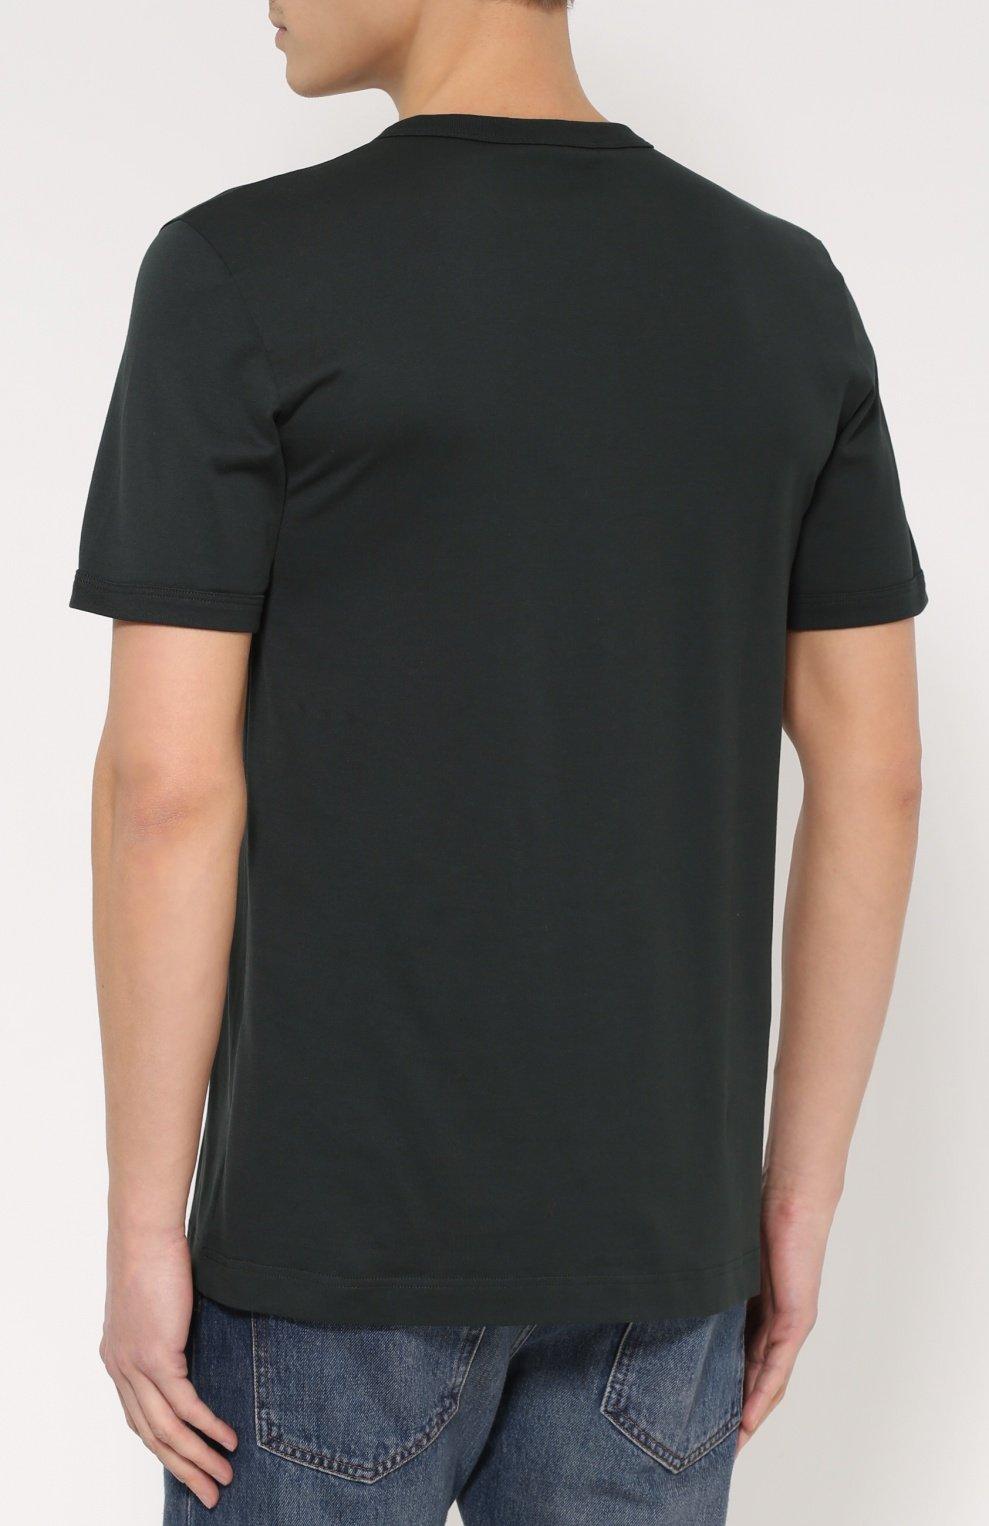 Хлопковая футболка хенли | Фото №4